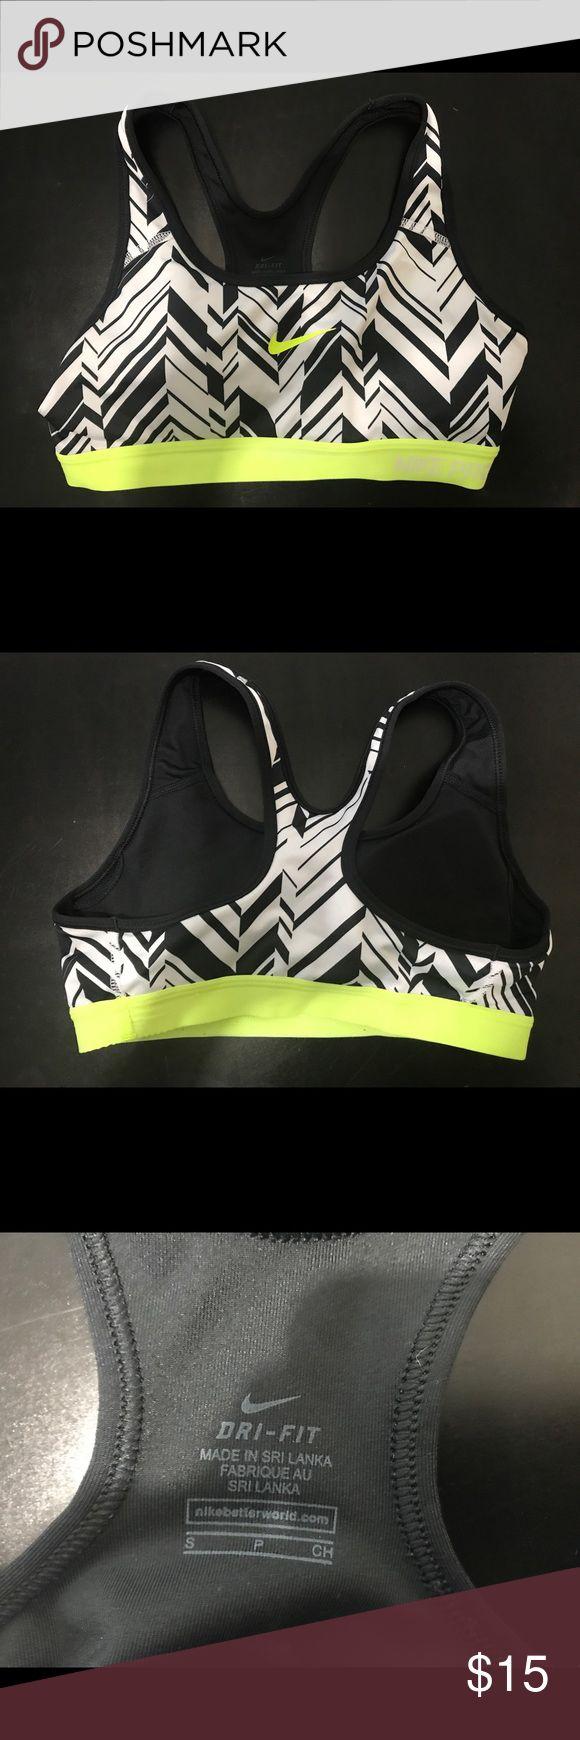 Nike Pro, Dri-fit Women Sport Bra Nike Pro Dri-fit Sport bra, woman small. Black and white chevron print Nike Intimates & Sleepwear Bras